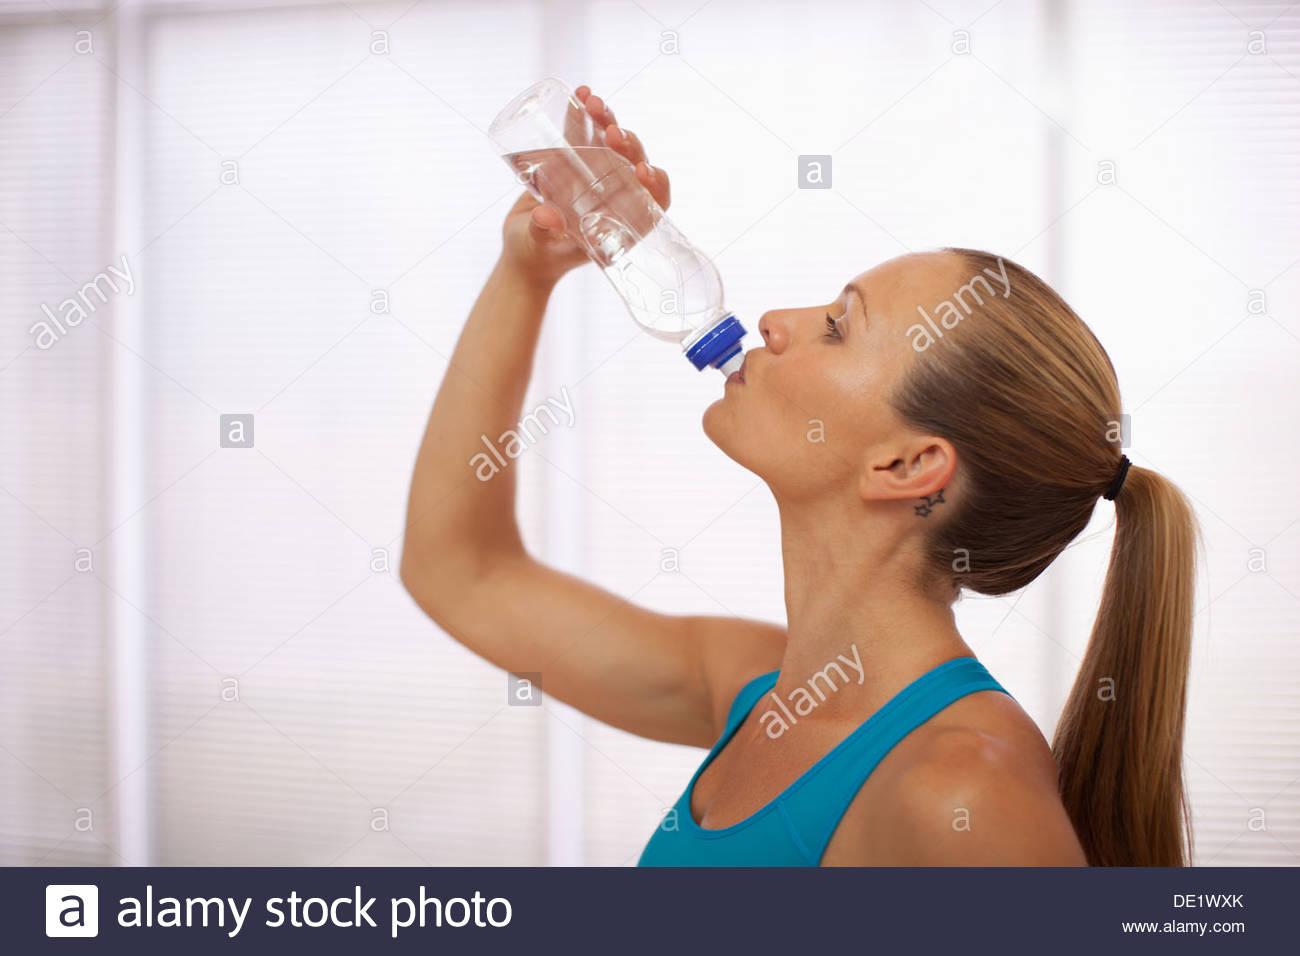 Woman in sports bra drinking water - Stock Image